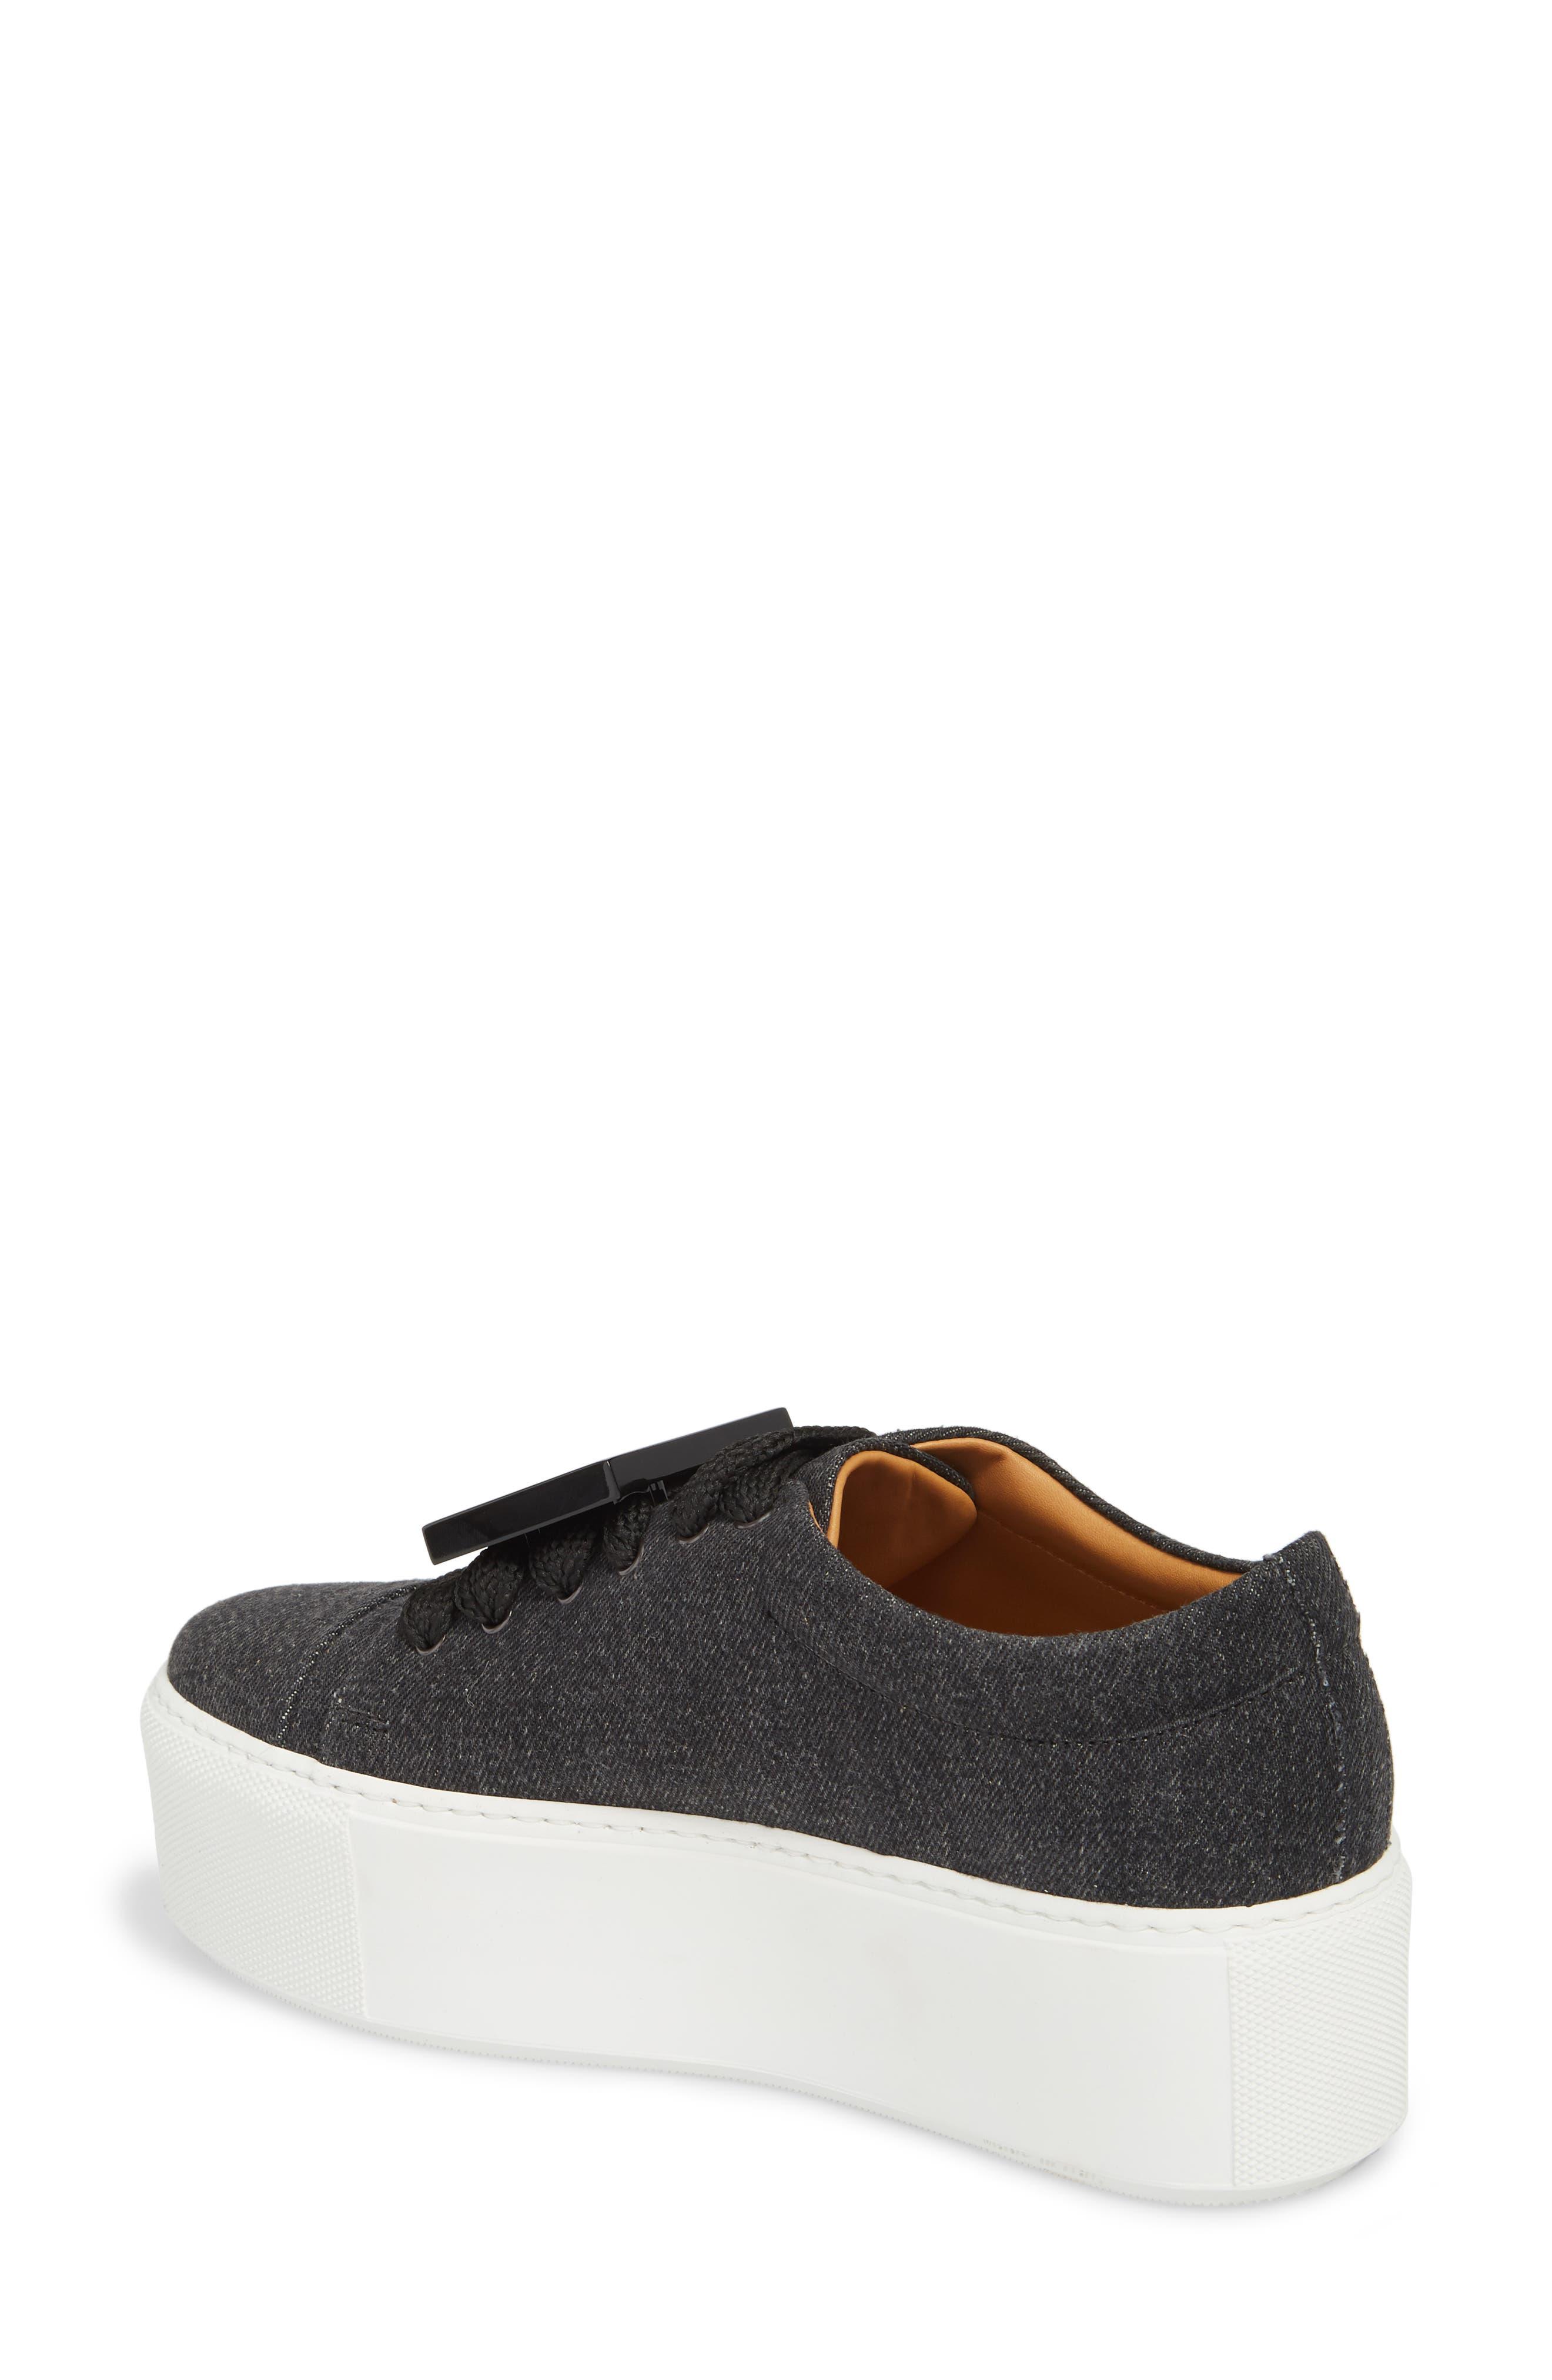 Drihanna Denim Platform Sneaker,                             Alternate thumbnail 2, color,                             001